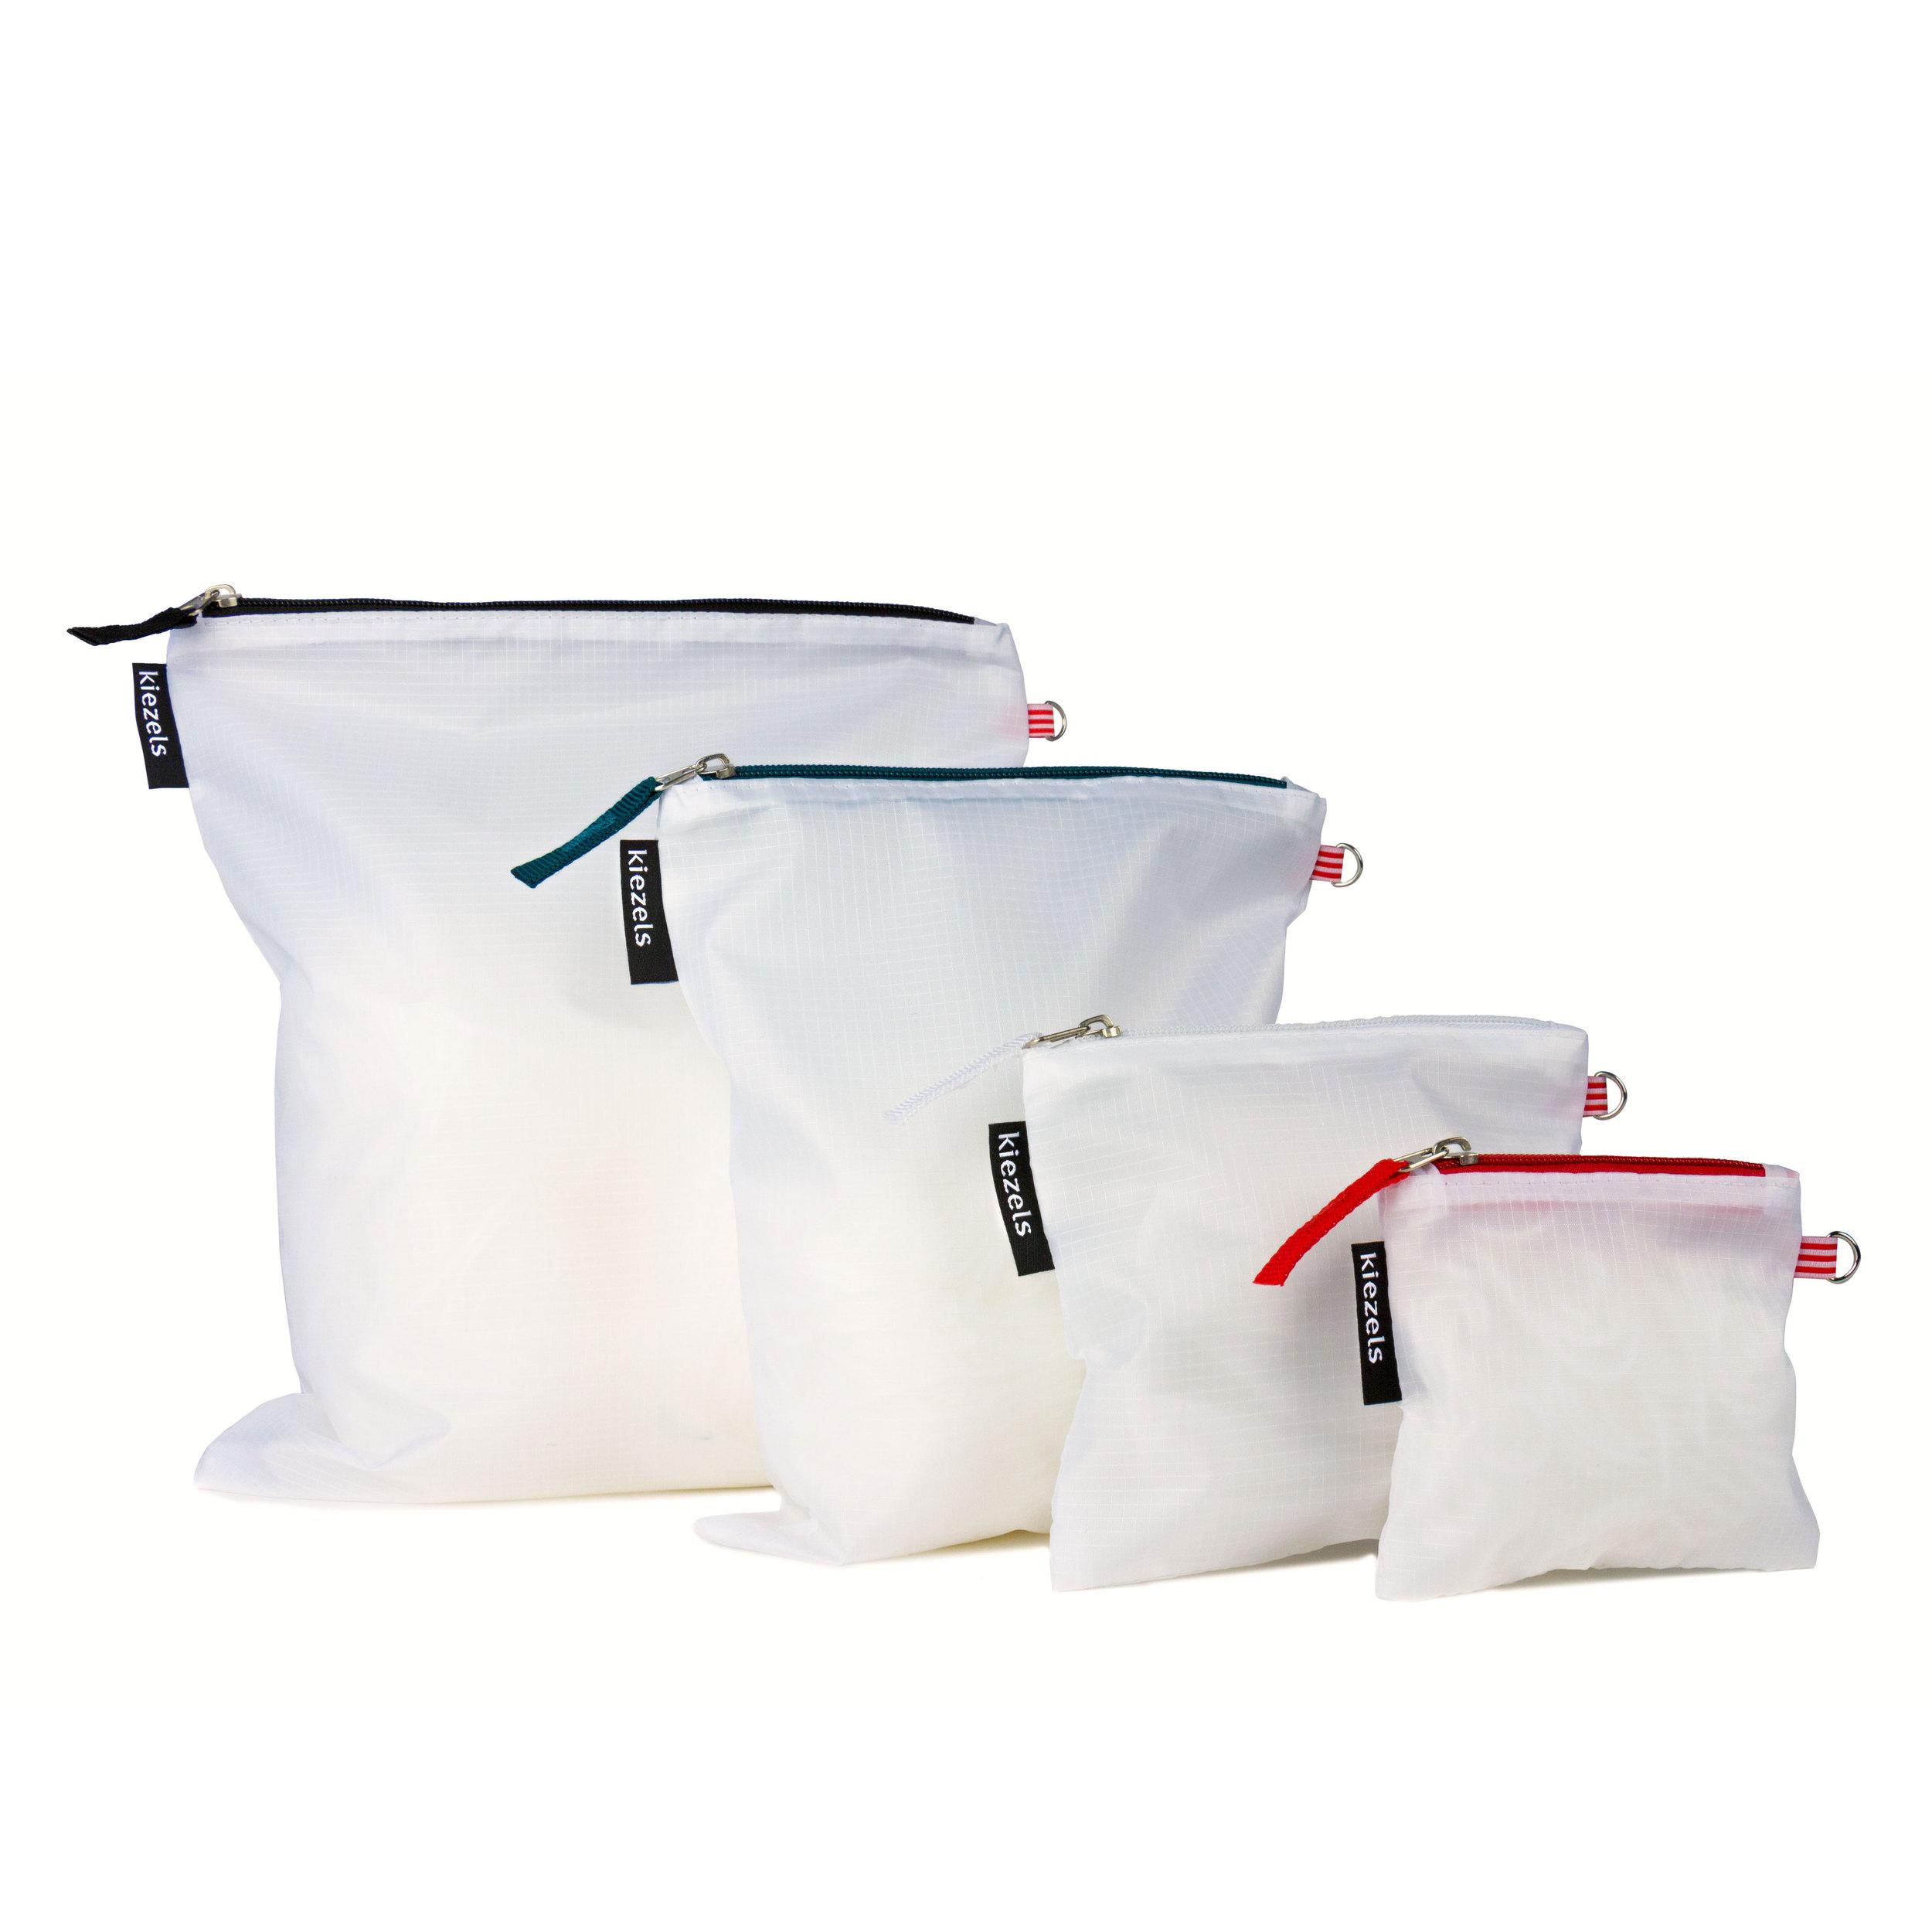 No. 205 Travel organiser bags - white € 18,50